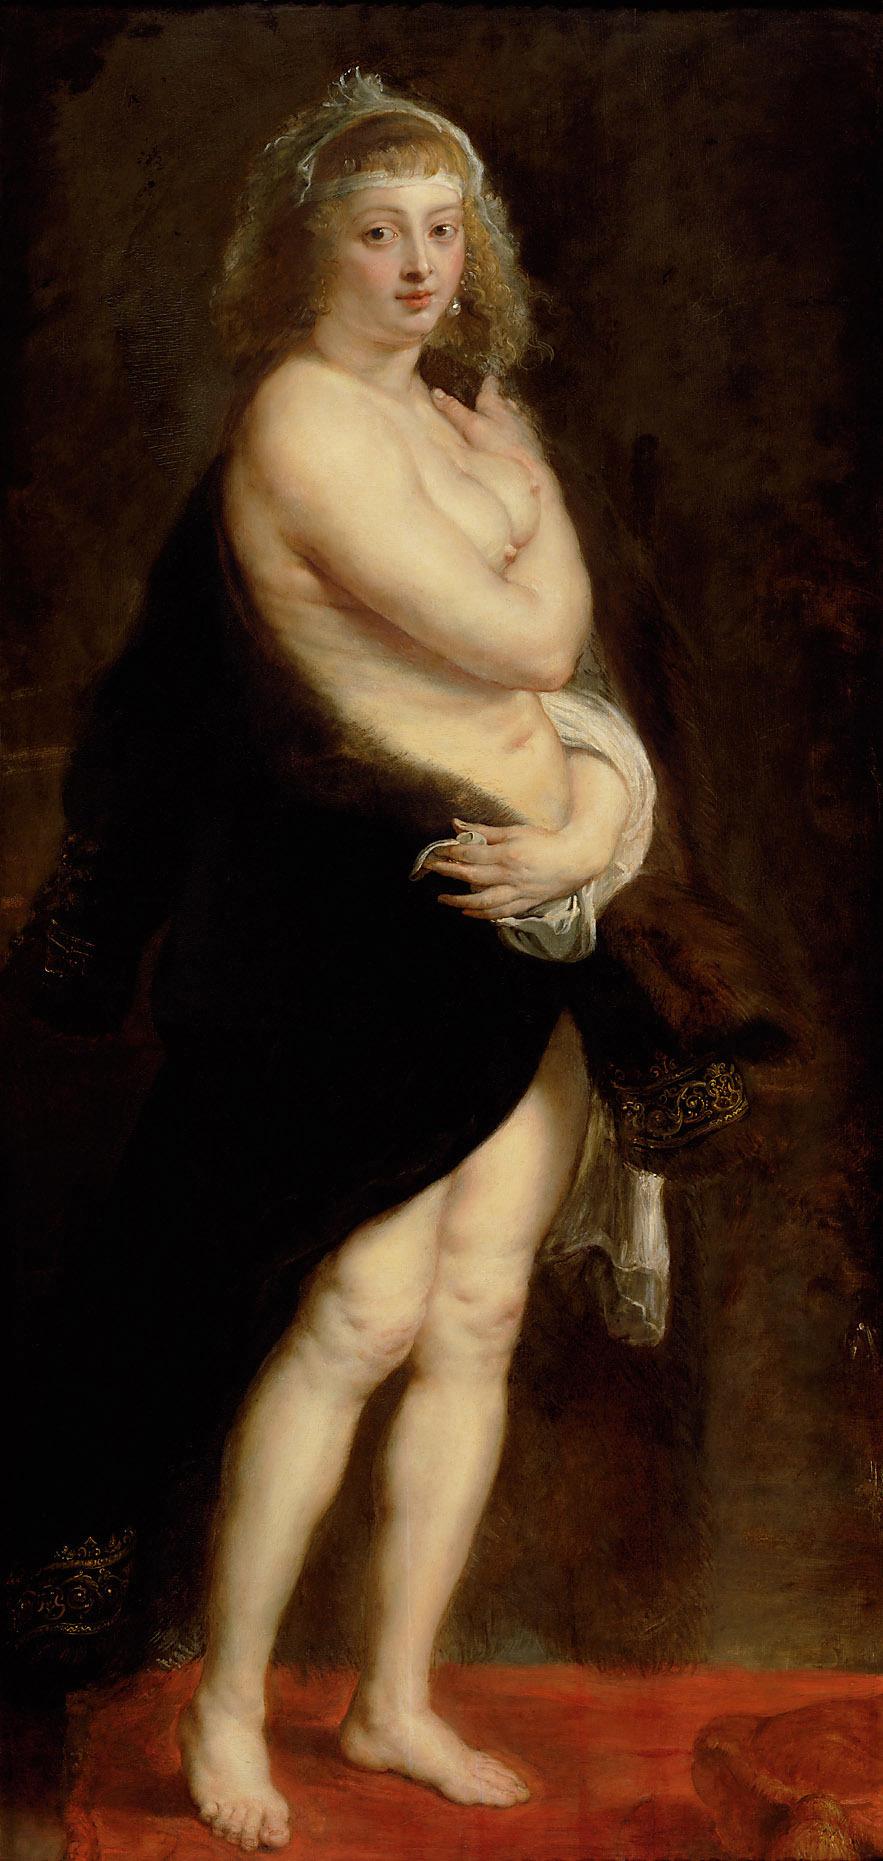 Peter Paul Rubens. Portrait of Helena Fourment (The little fur coat)